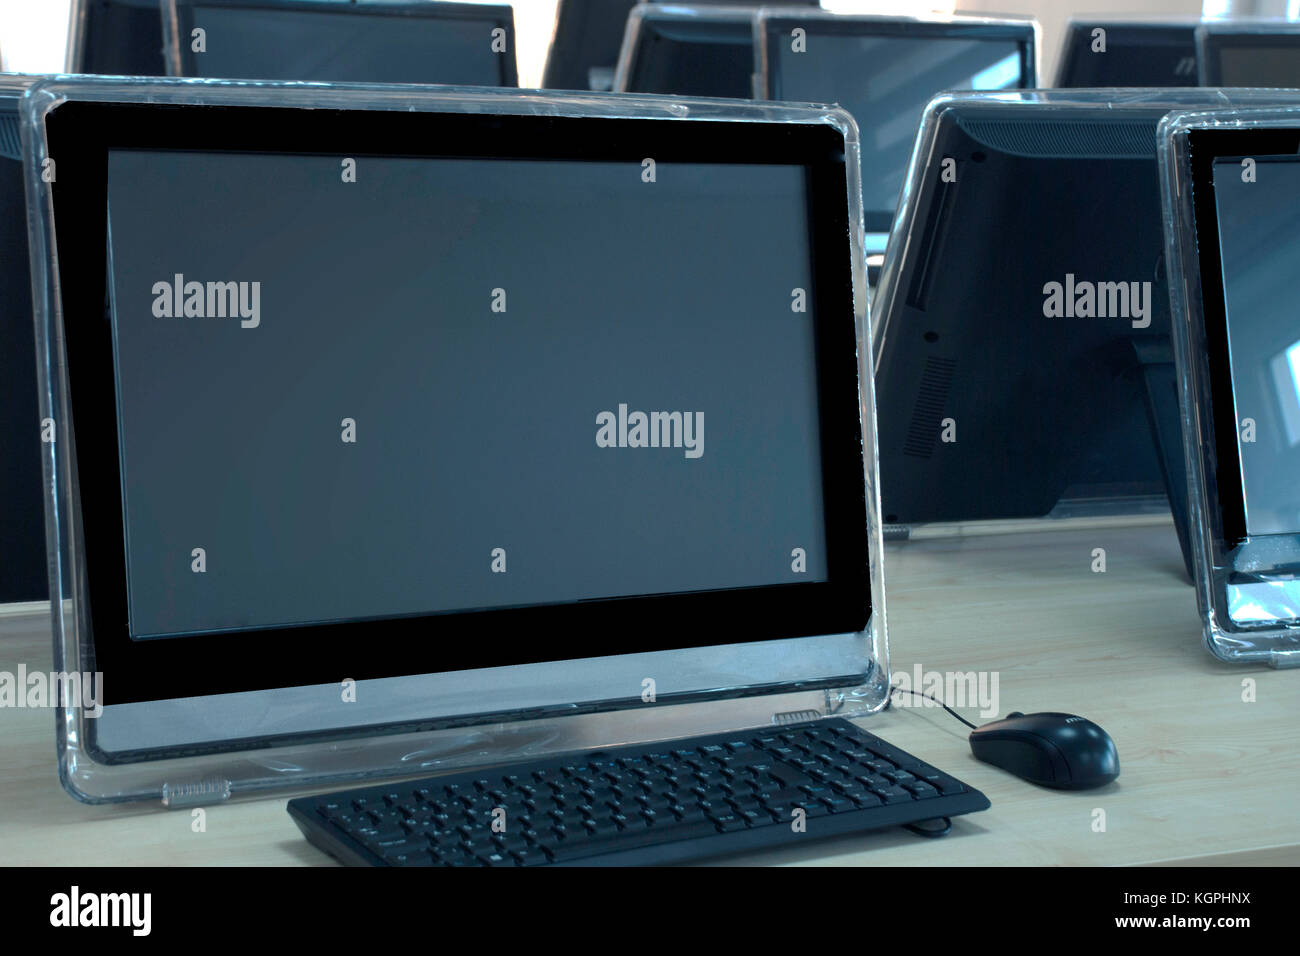 Computer Lab - Stock Image